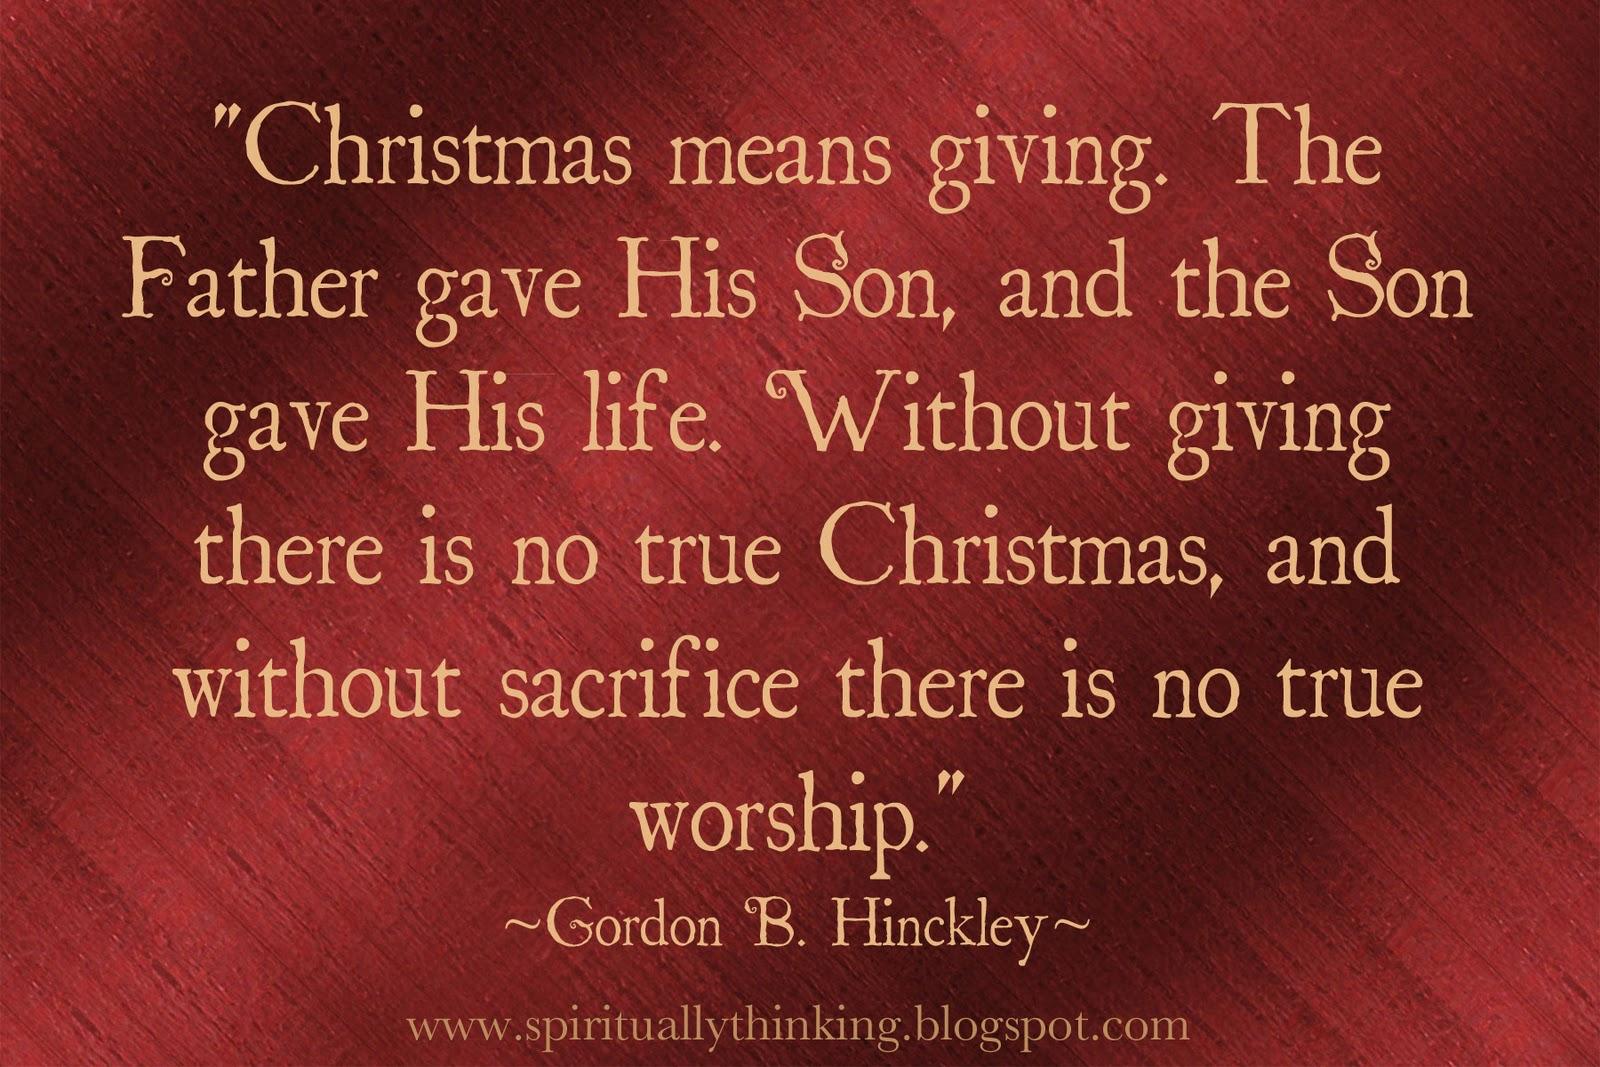 Life Sacrifice Quotes And Spiritually Speaking Christmas Giving & Sacrifice